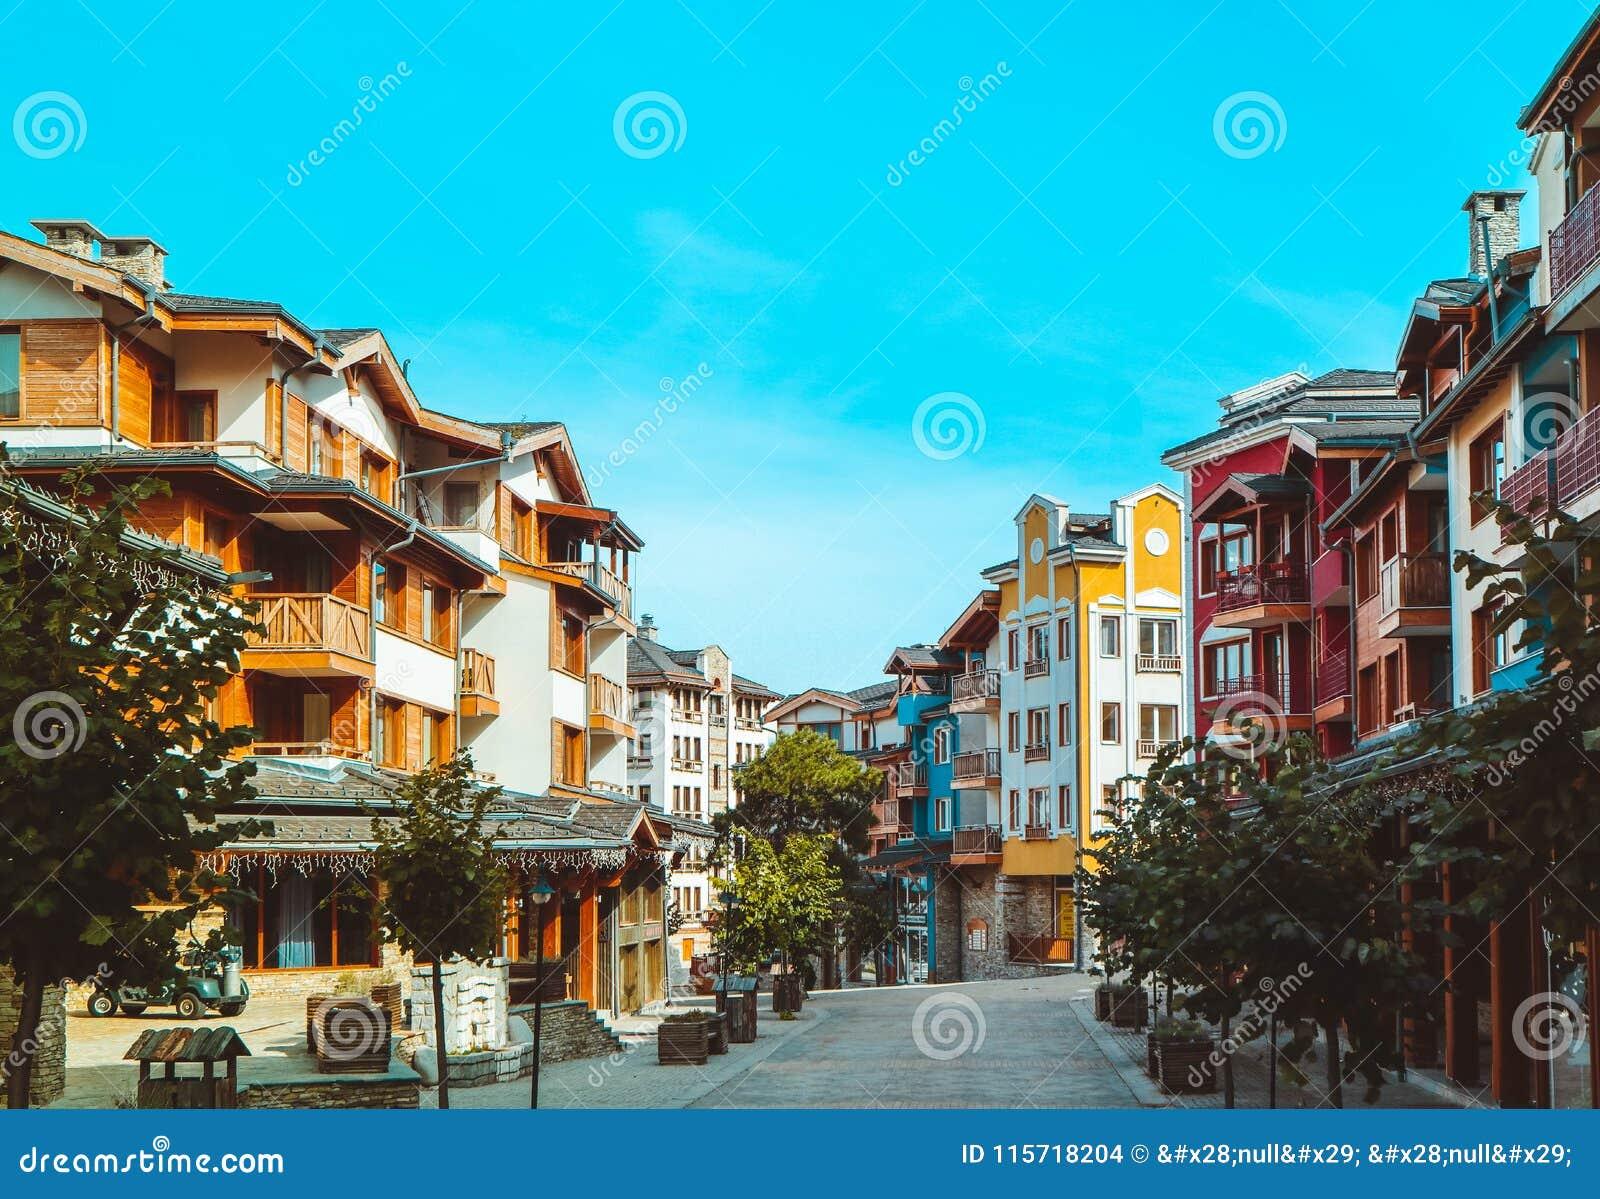 Apartments In Balkans Mountains, Europe, Bulgaria. Luxury Houses At The  Pirin Golf Village, Summertime.